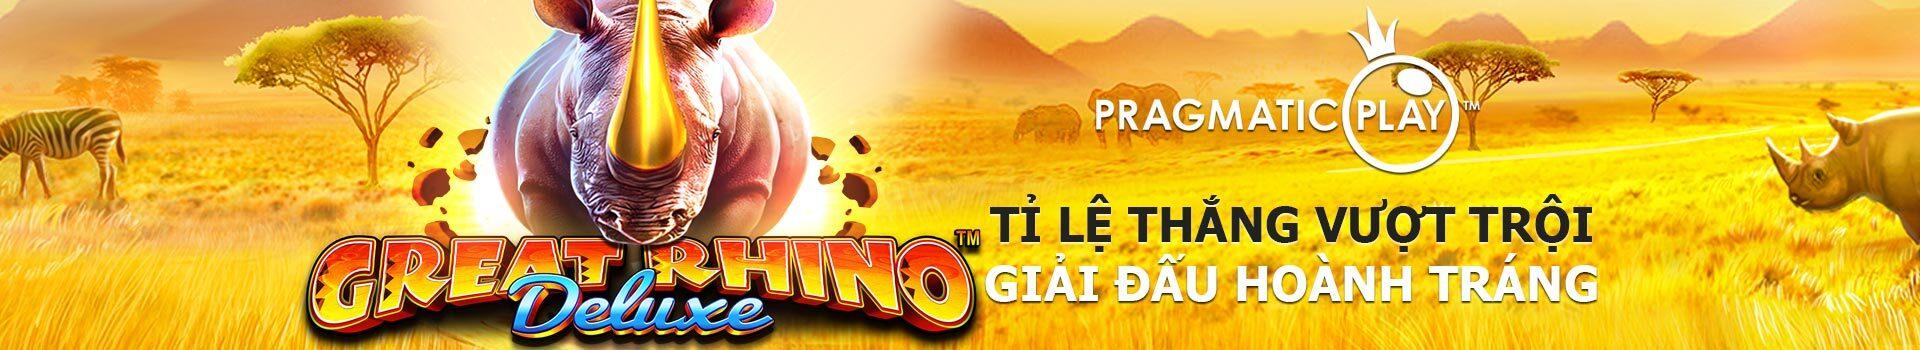 vwin giới thiệu Slot Game Great Rhino Deluxe – Trò chơi PP